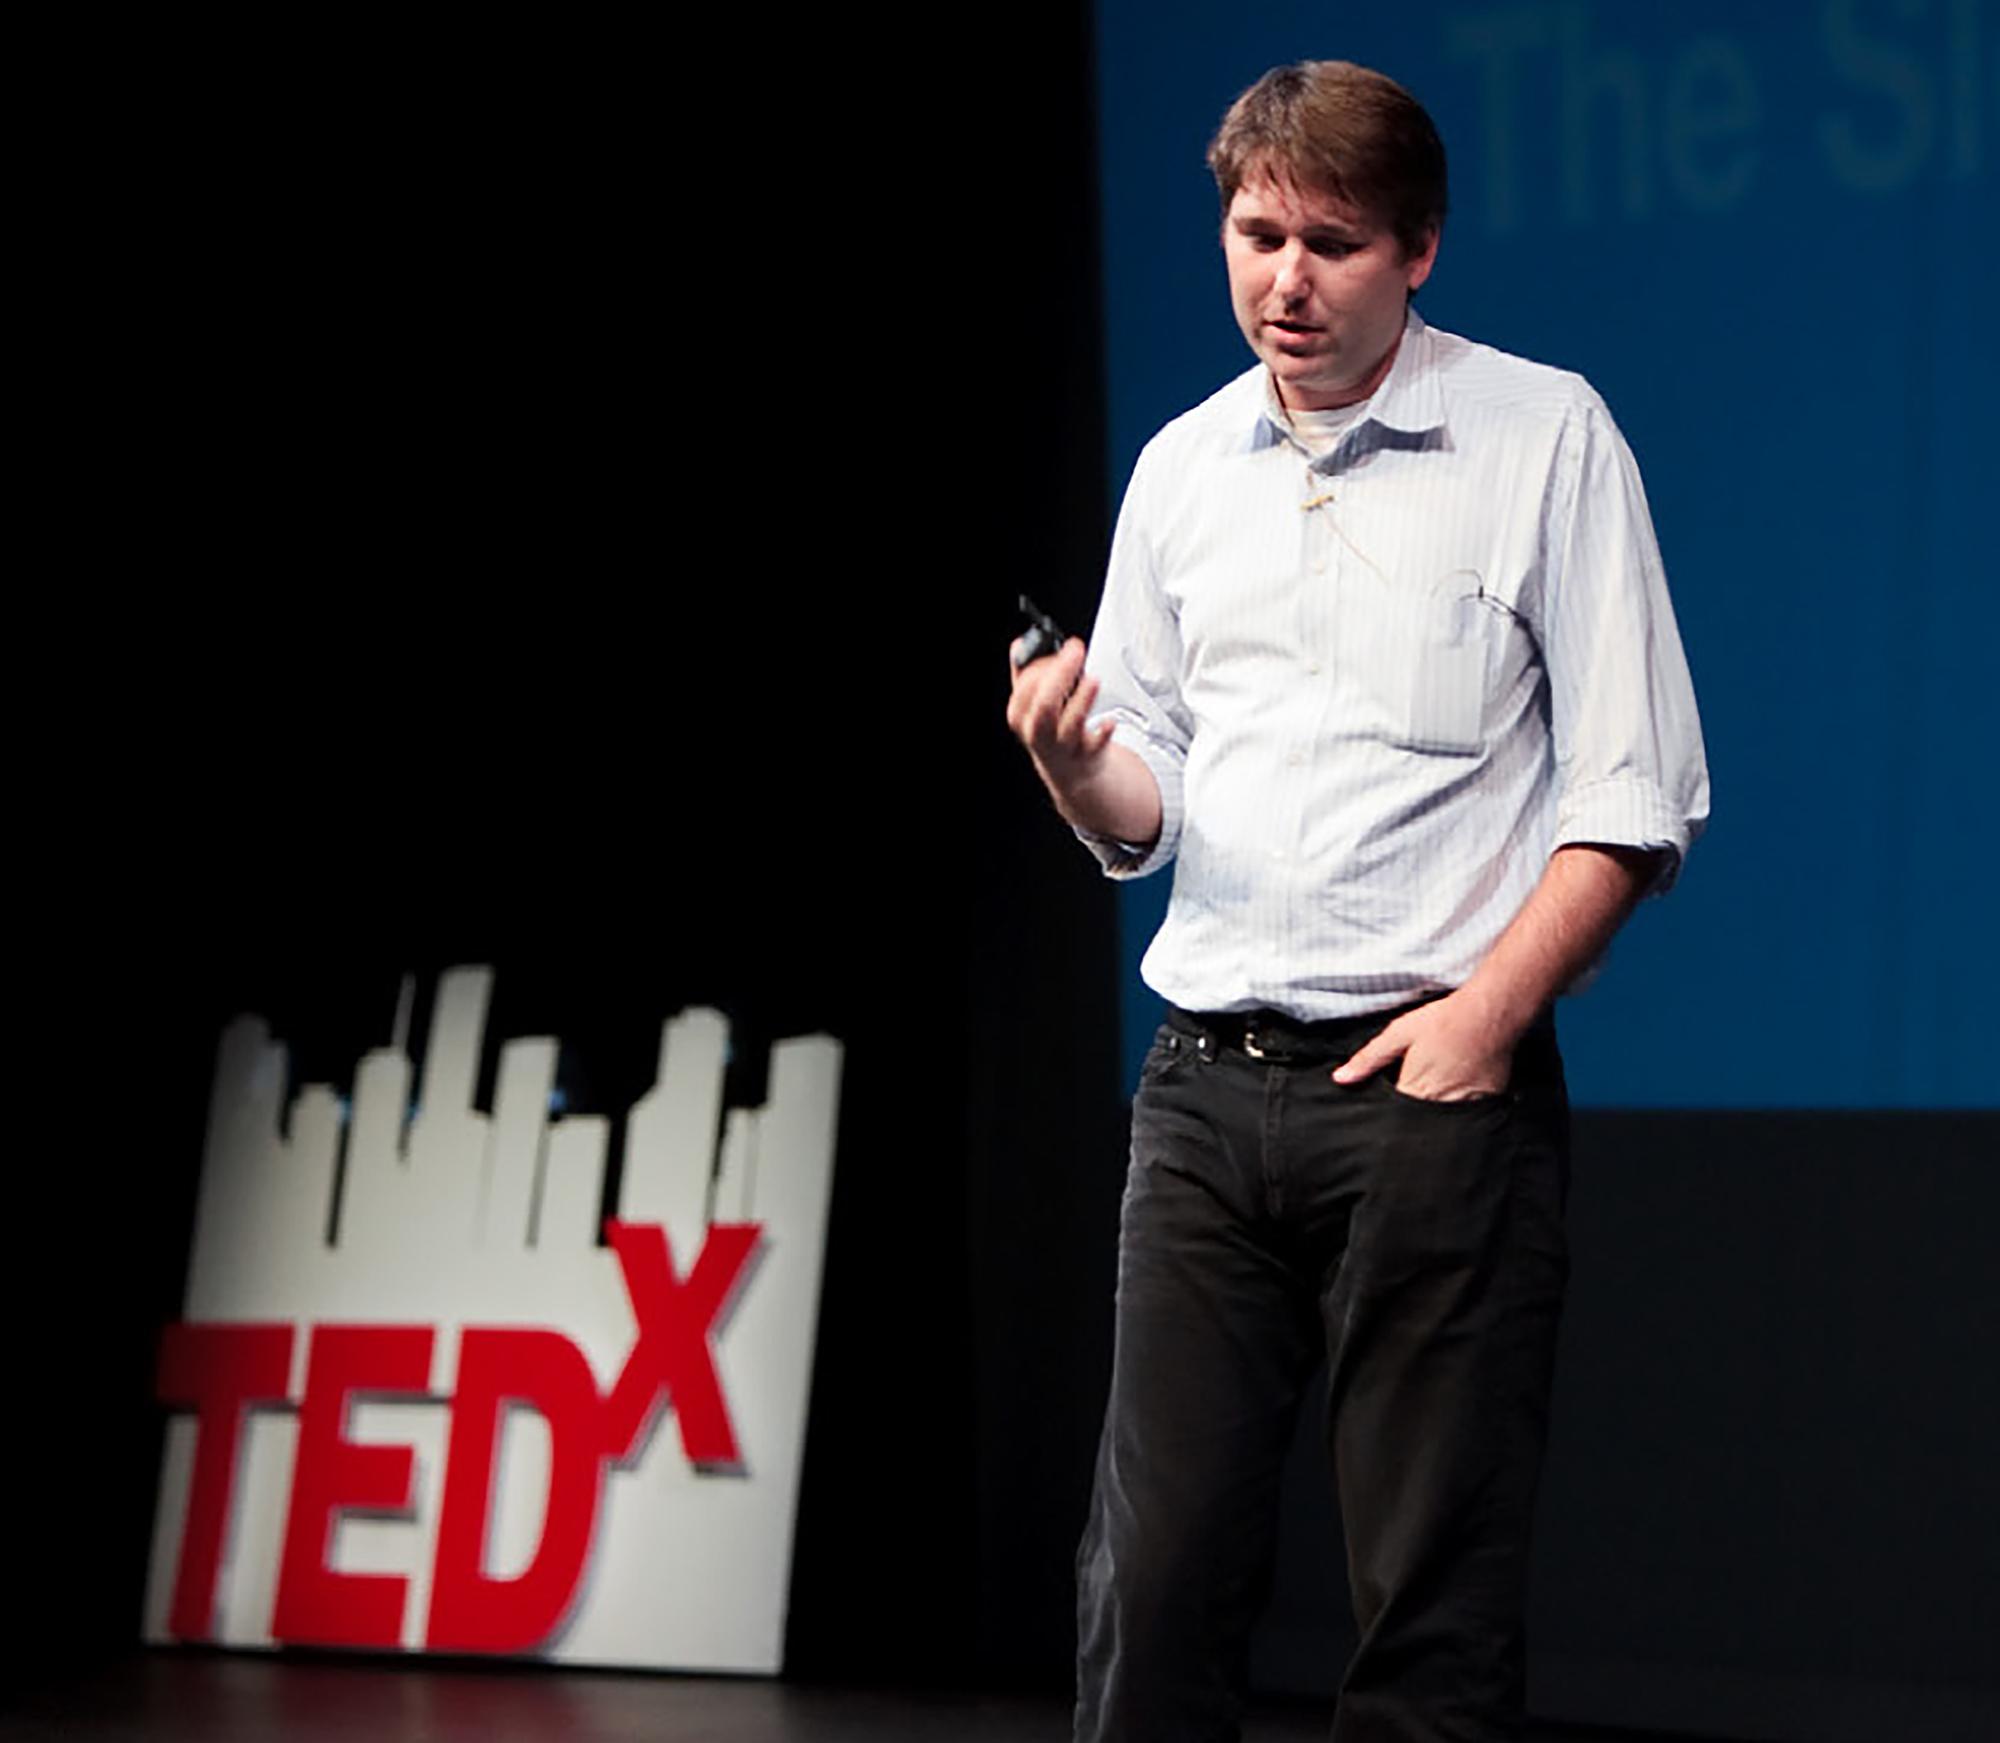 05_Hometta_TEDx.jpg